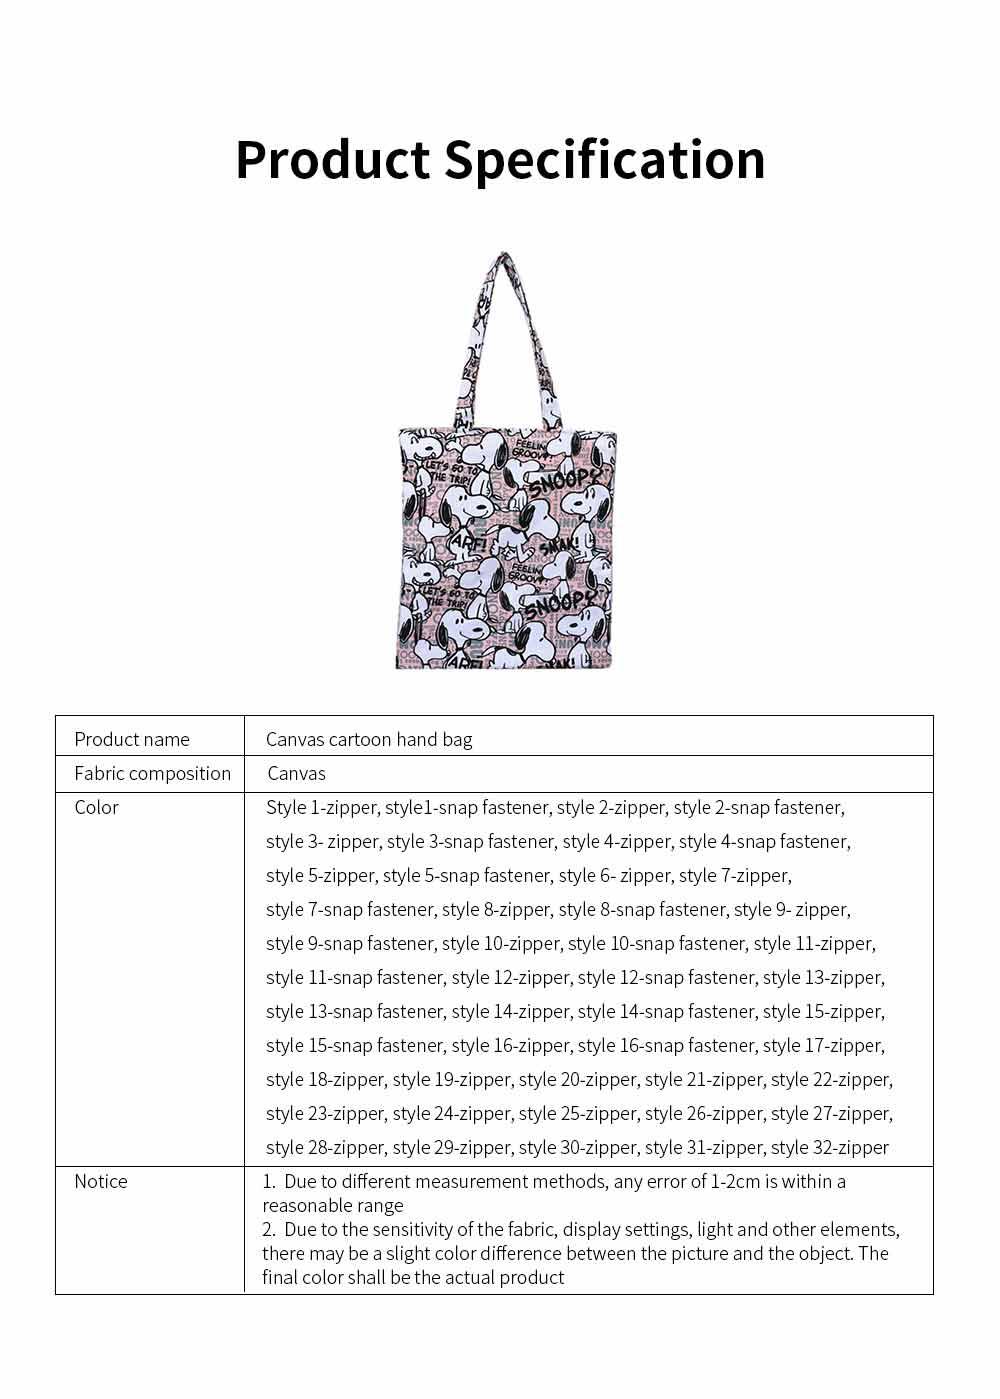 Canvas Cartoon Hand Bag Shoulder Bag, Environmental Protection Shopping Bag, Single-shoulder Bag with Lovely Cartoon Image 6